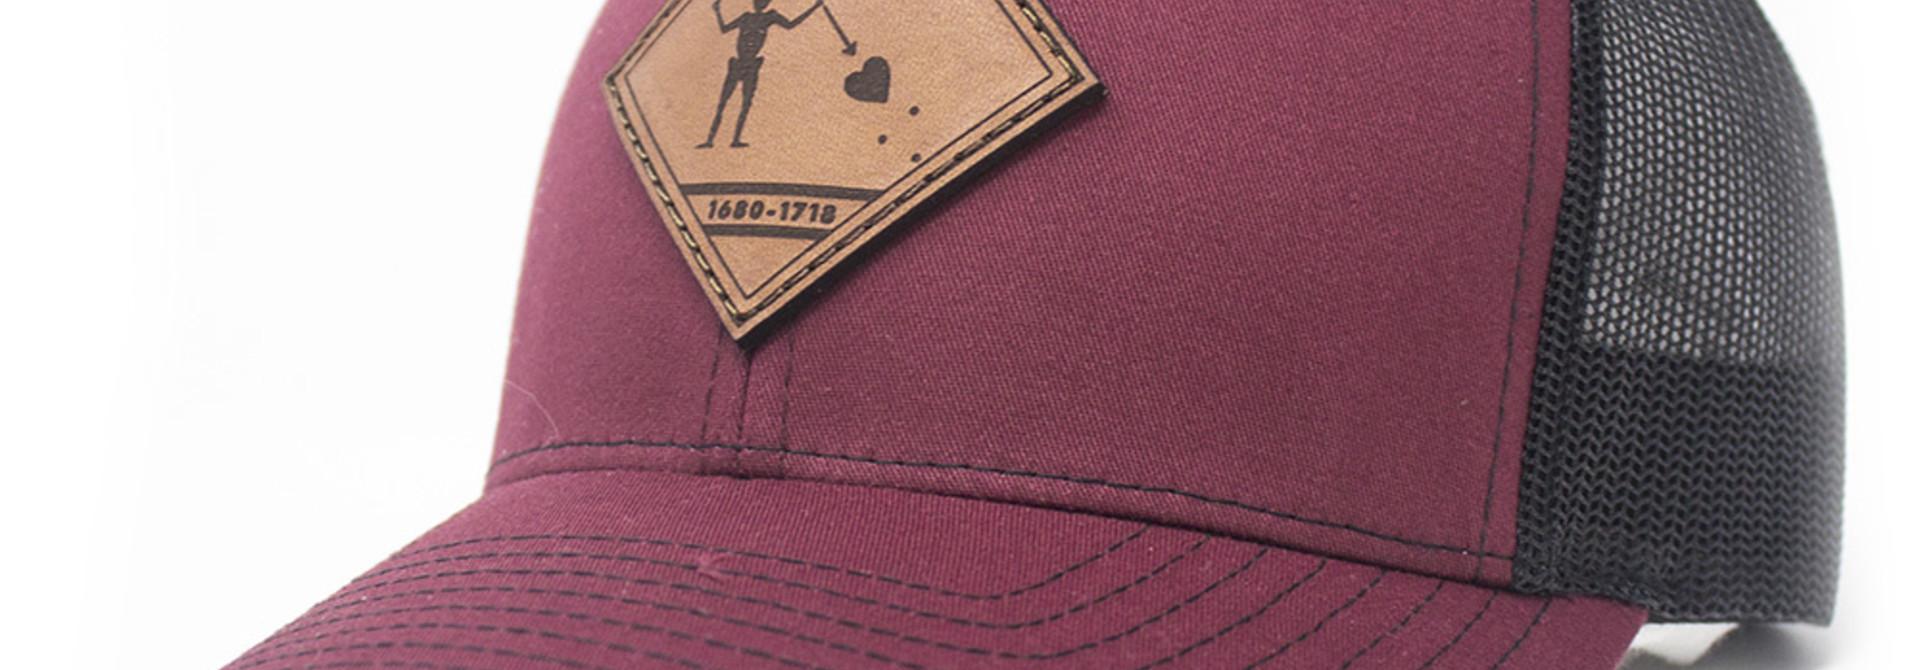 Blackbeard Leather Patch Lo Pro Trucker Hat, Cardinal and Black